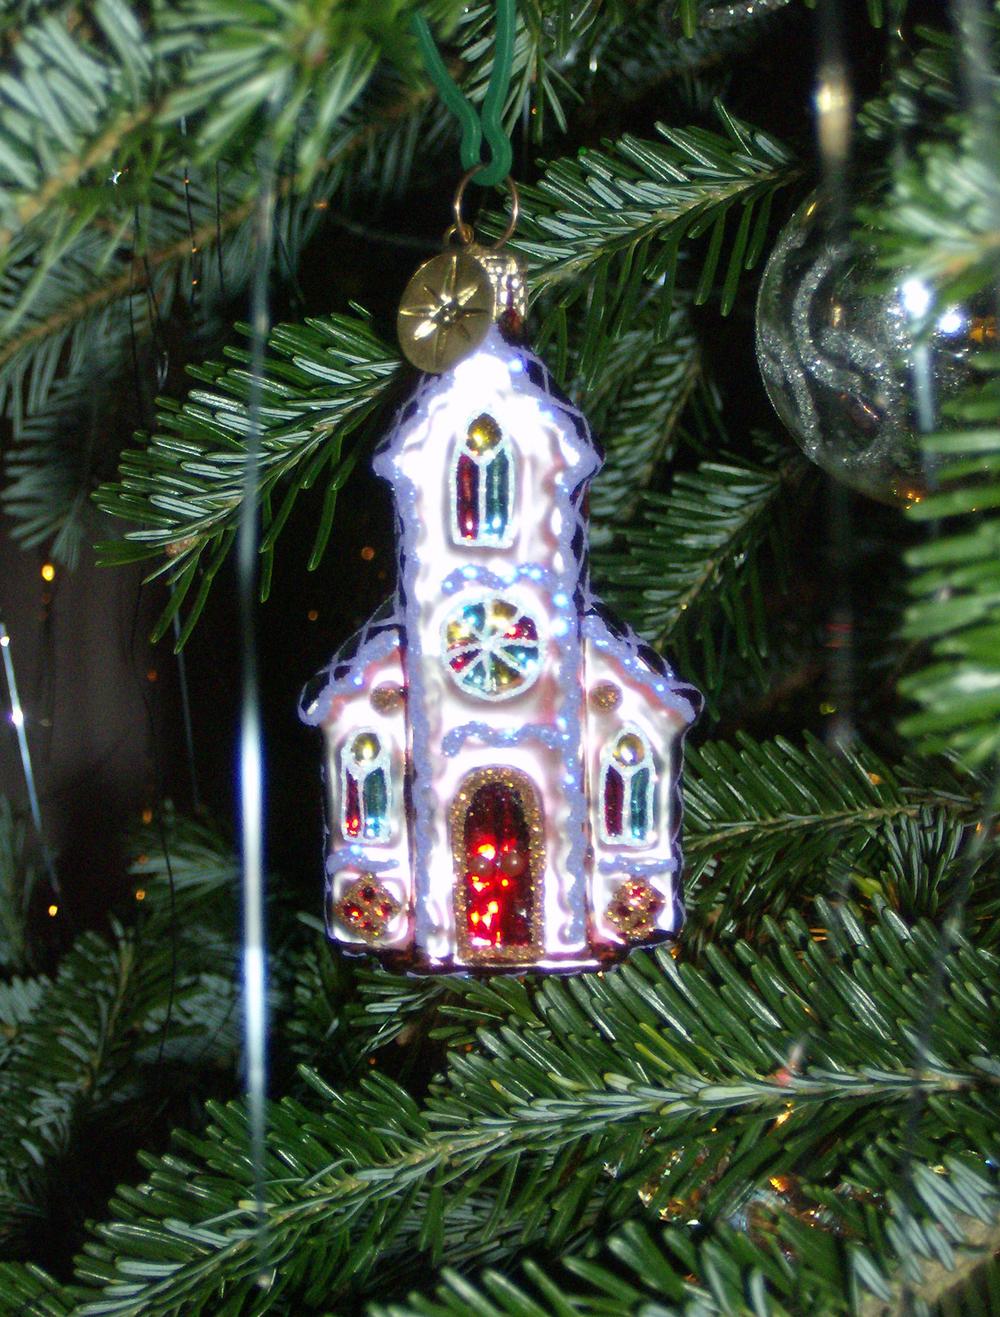 The church ornament .